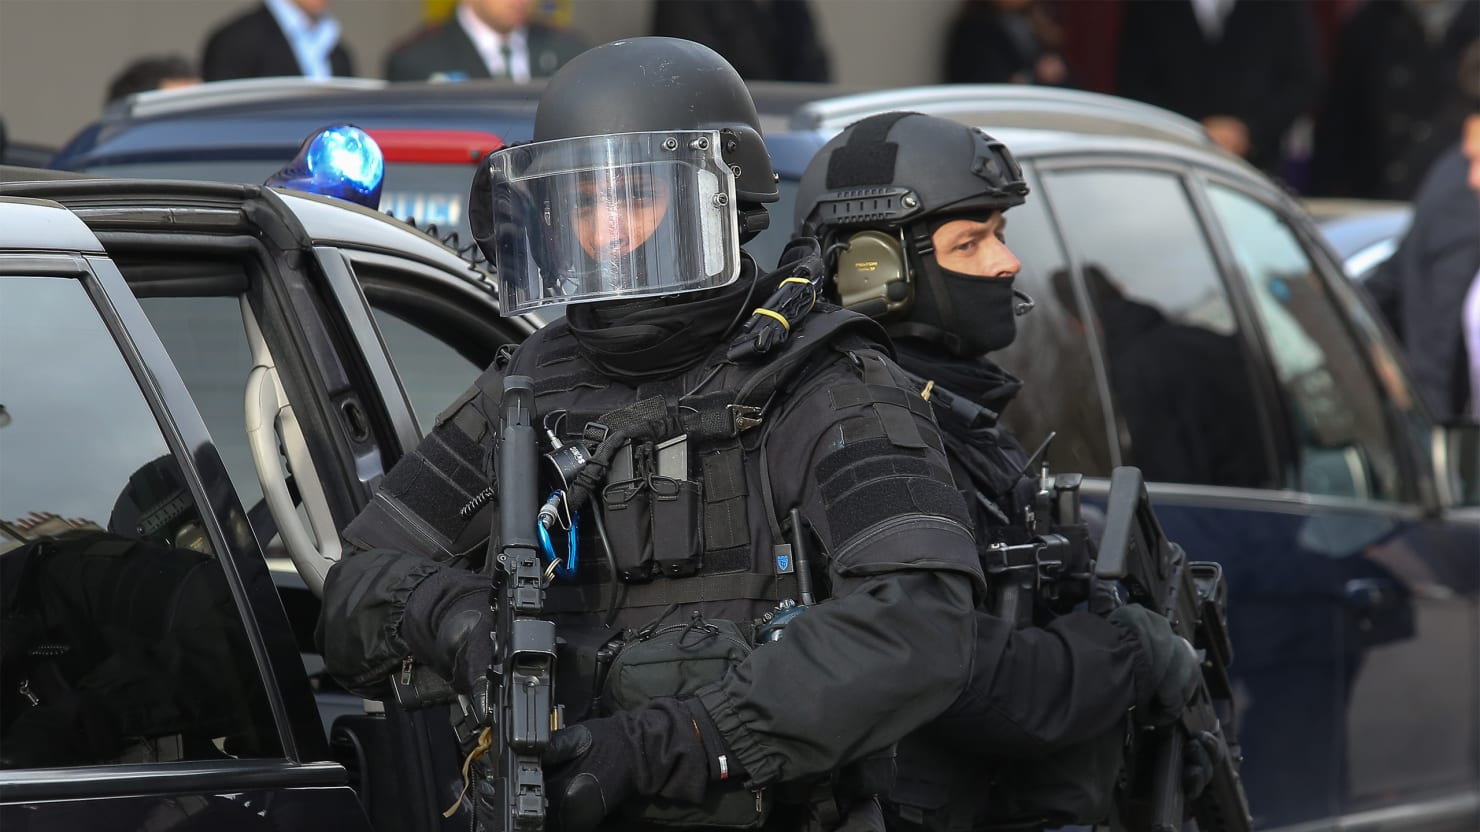 France's SEAL Team Six